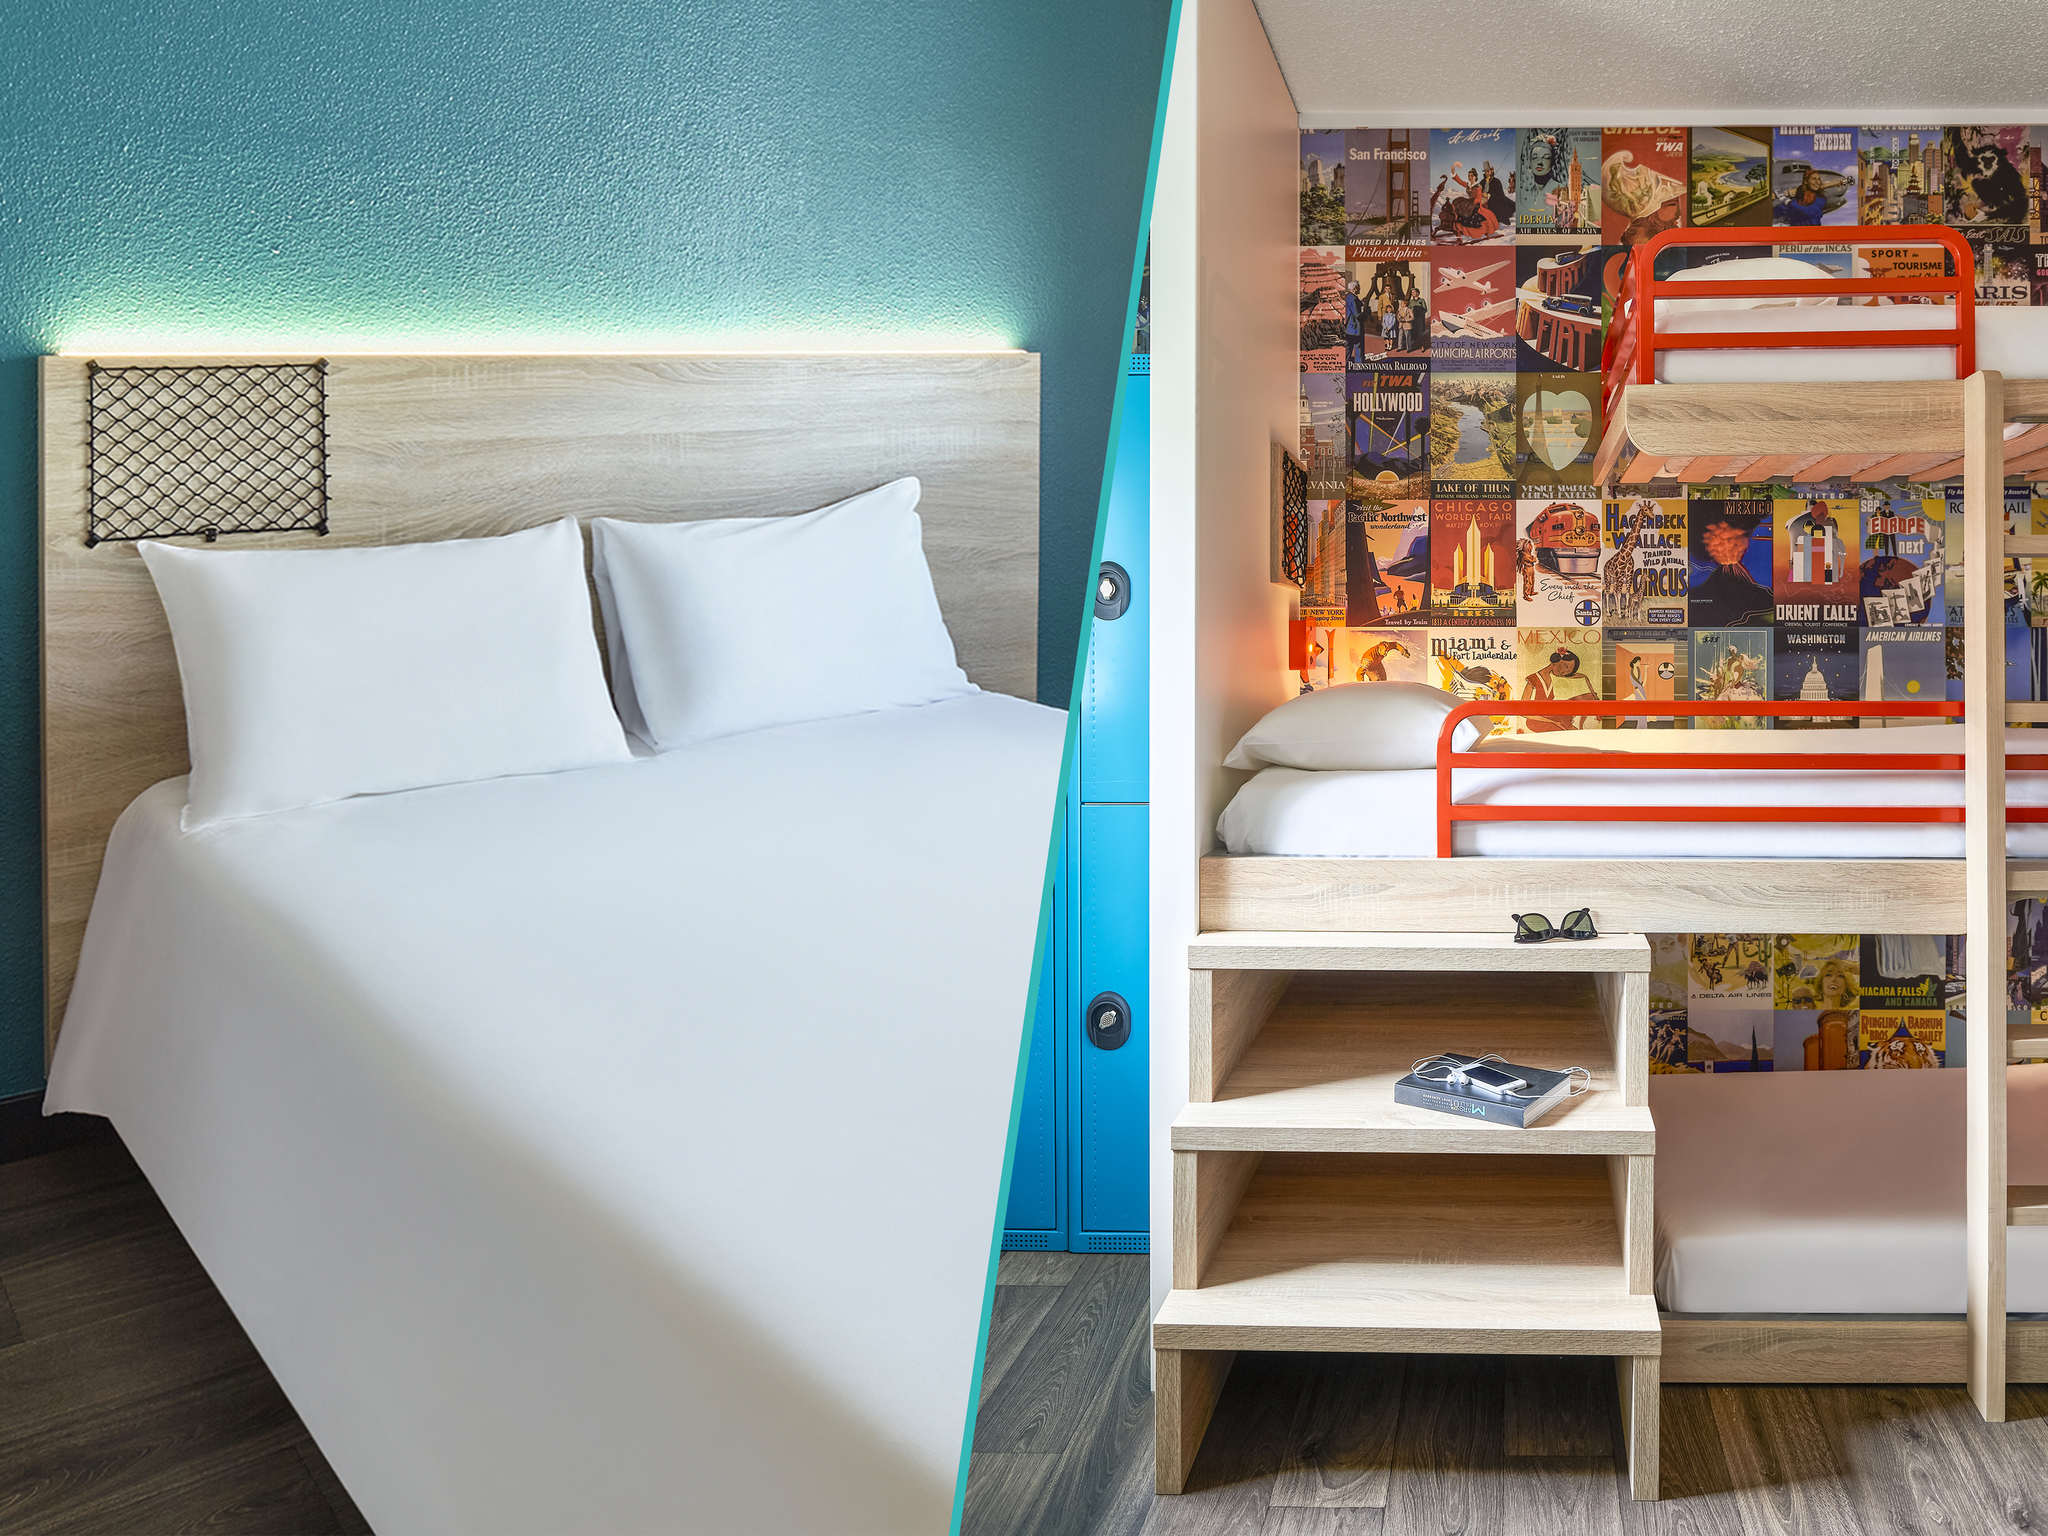 Hotel - hotelF1 Paris Porte de Montmartre